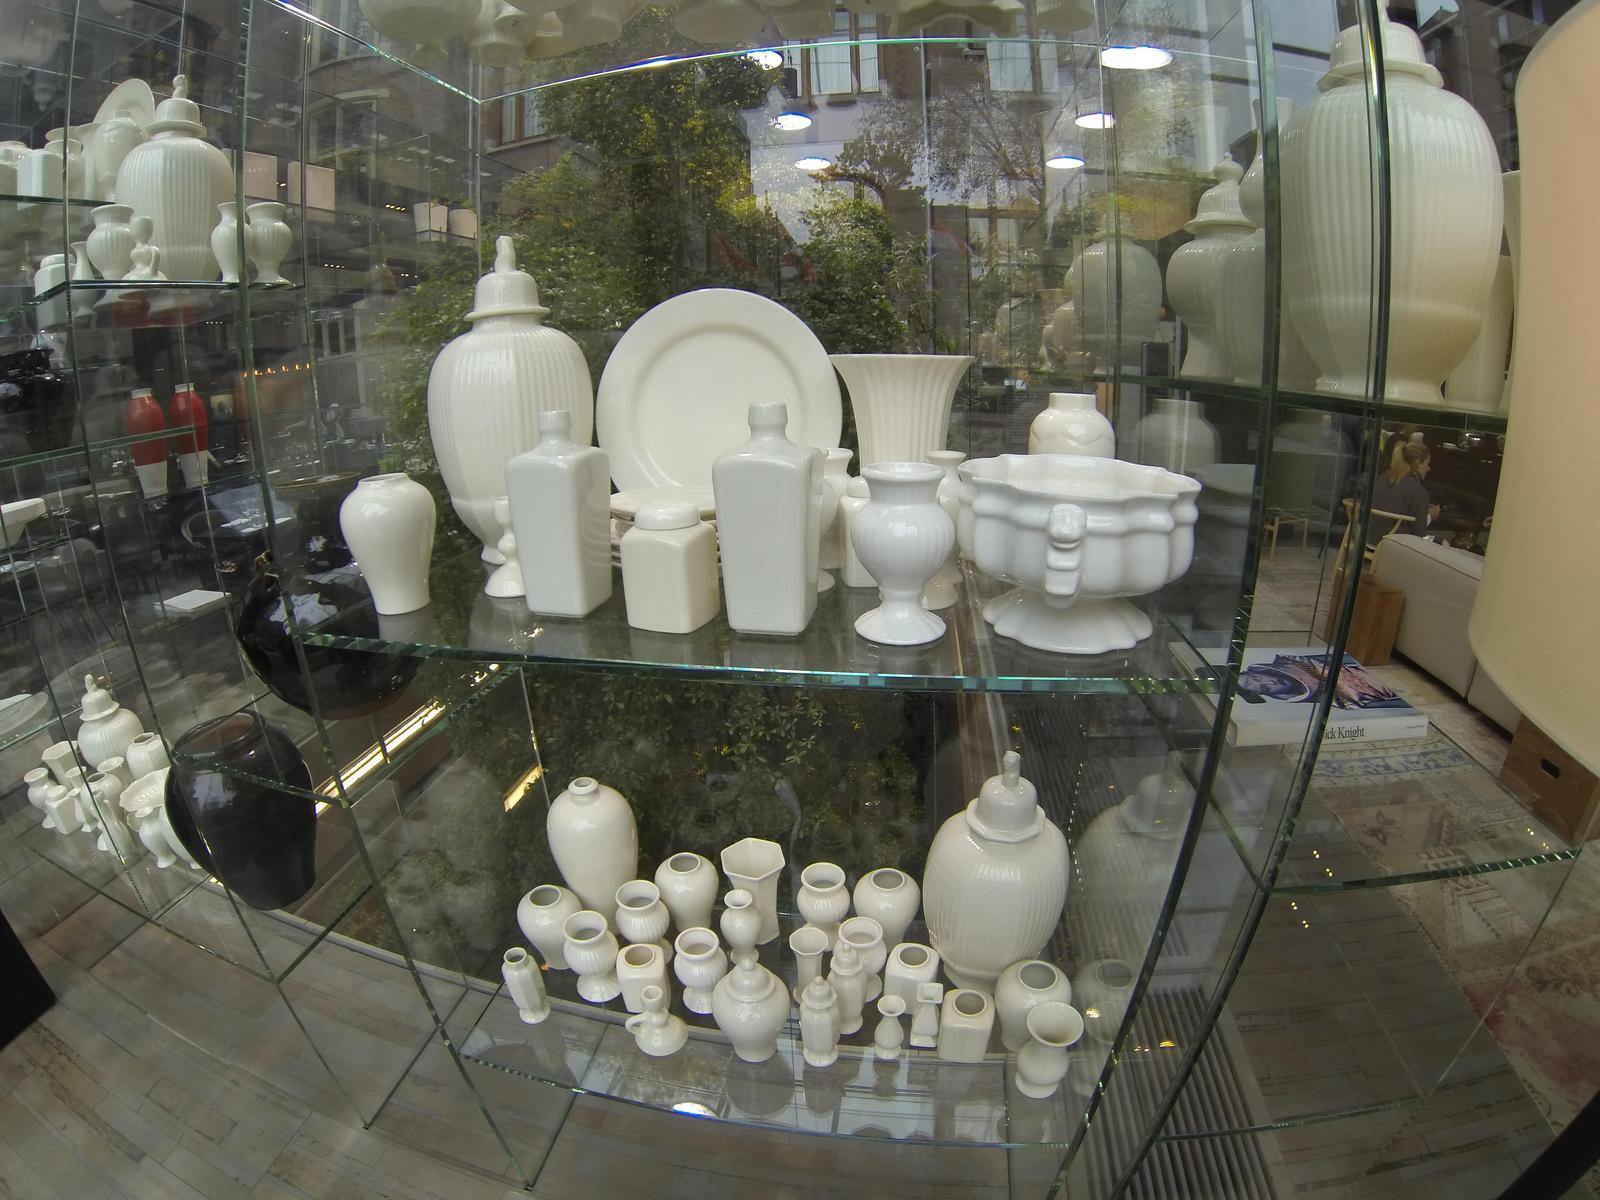 white-dutch-ceramics-on-display-in-glass-freestanding-shelving-in-lobby-conservatorium-hotel-amsterdam.jpg